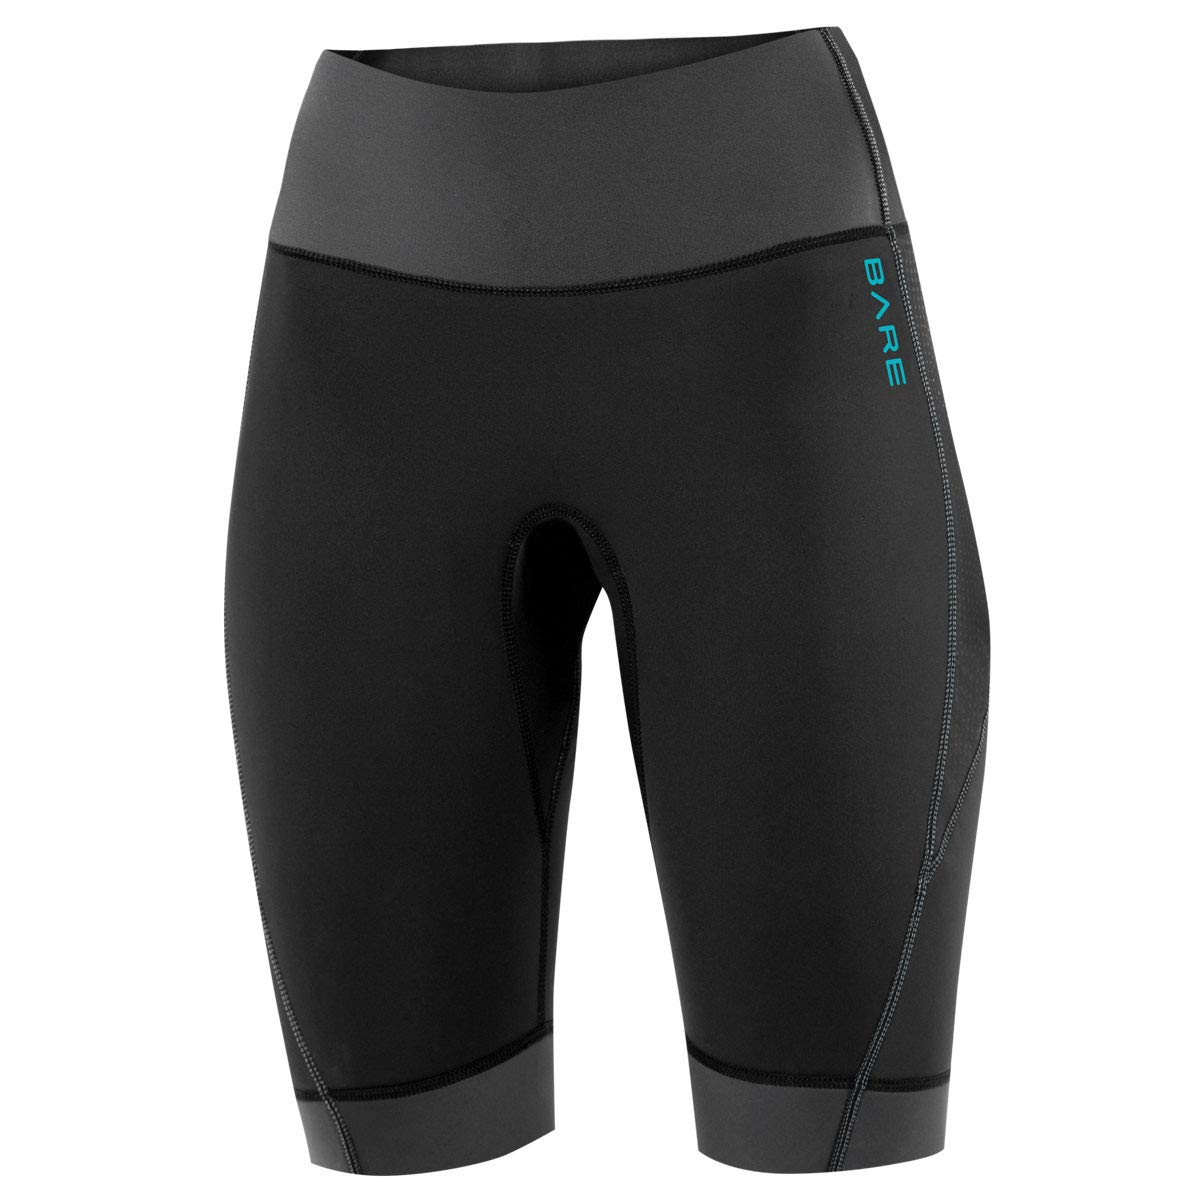 Bare Womens Exowear Shorts Wet/Dry Undergarment (2)